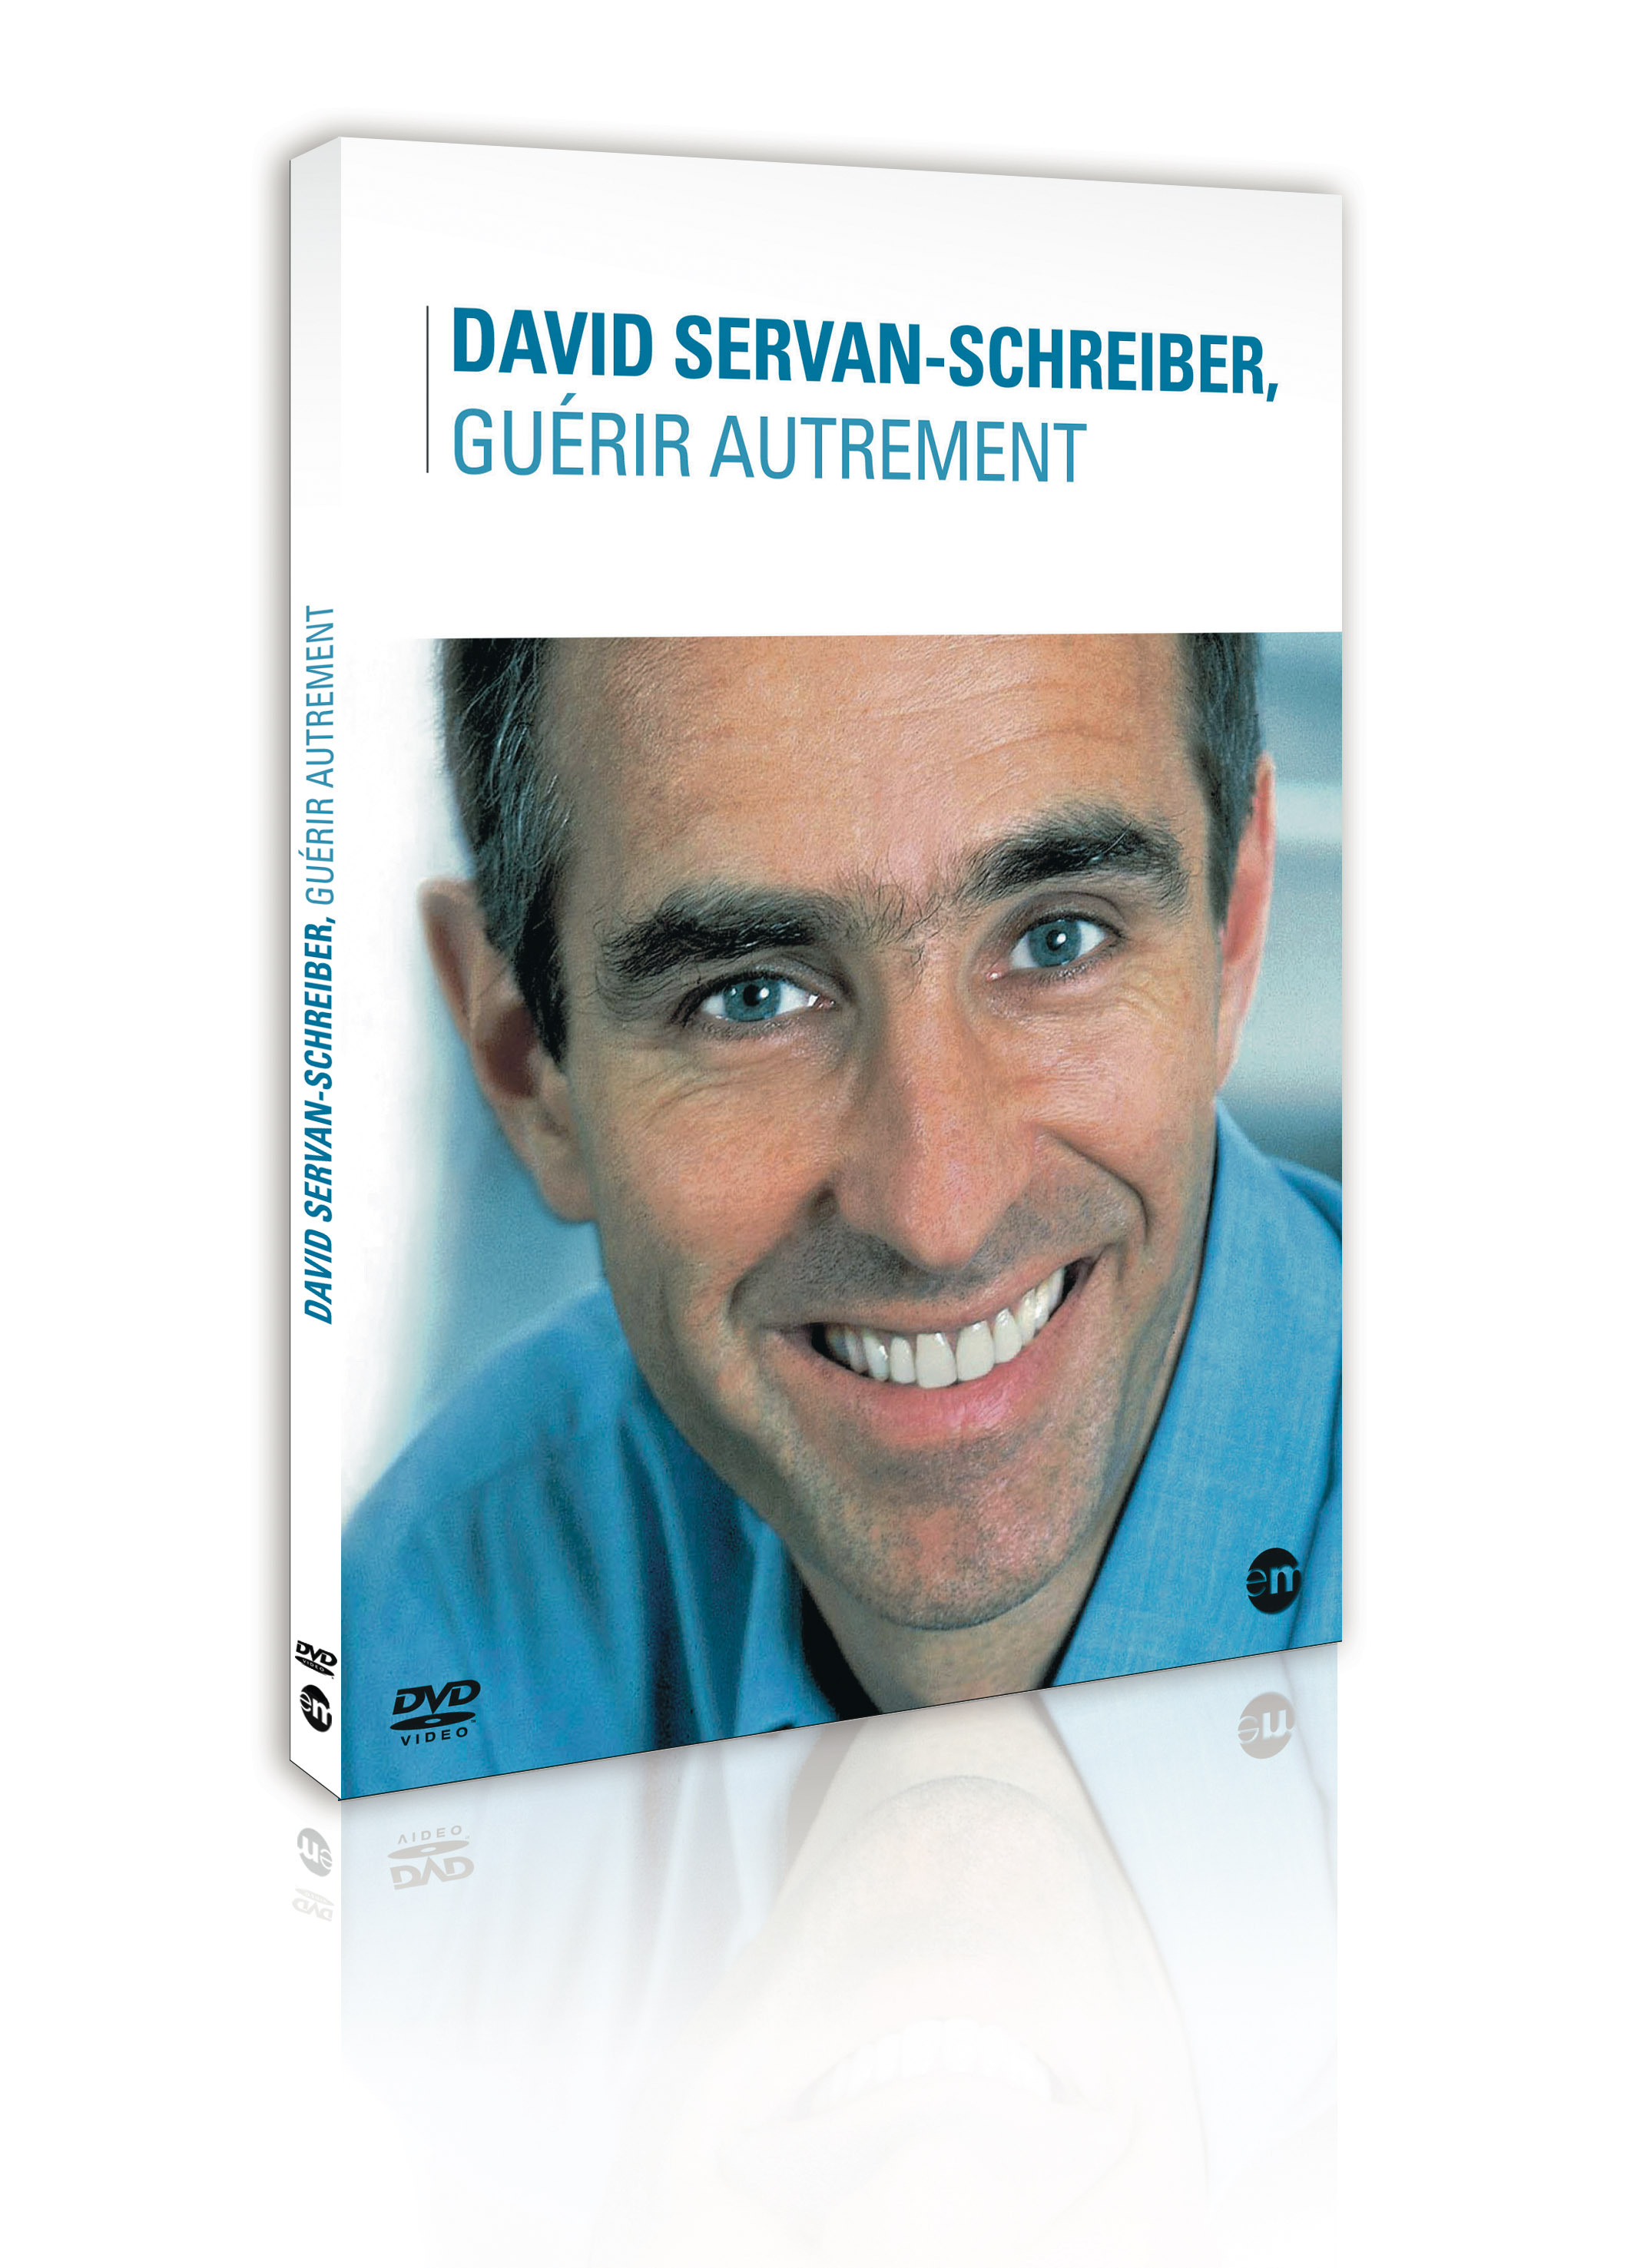 DAVID SERVAN-SHREIBER - DVD  GUERIR AUTREMENT